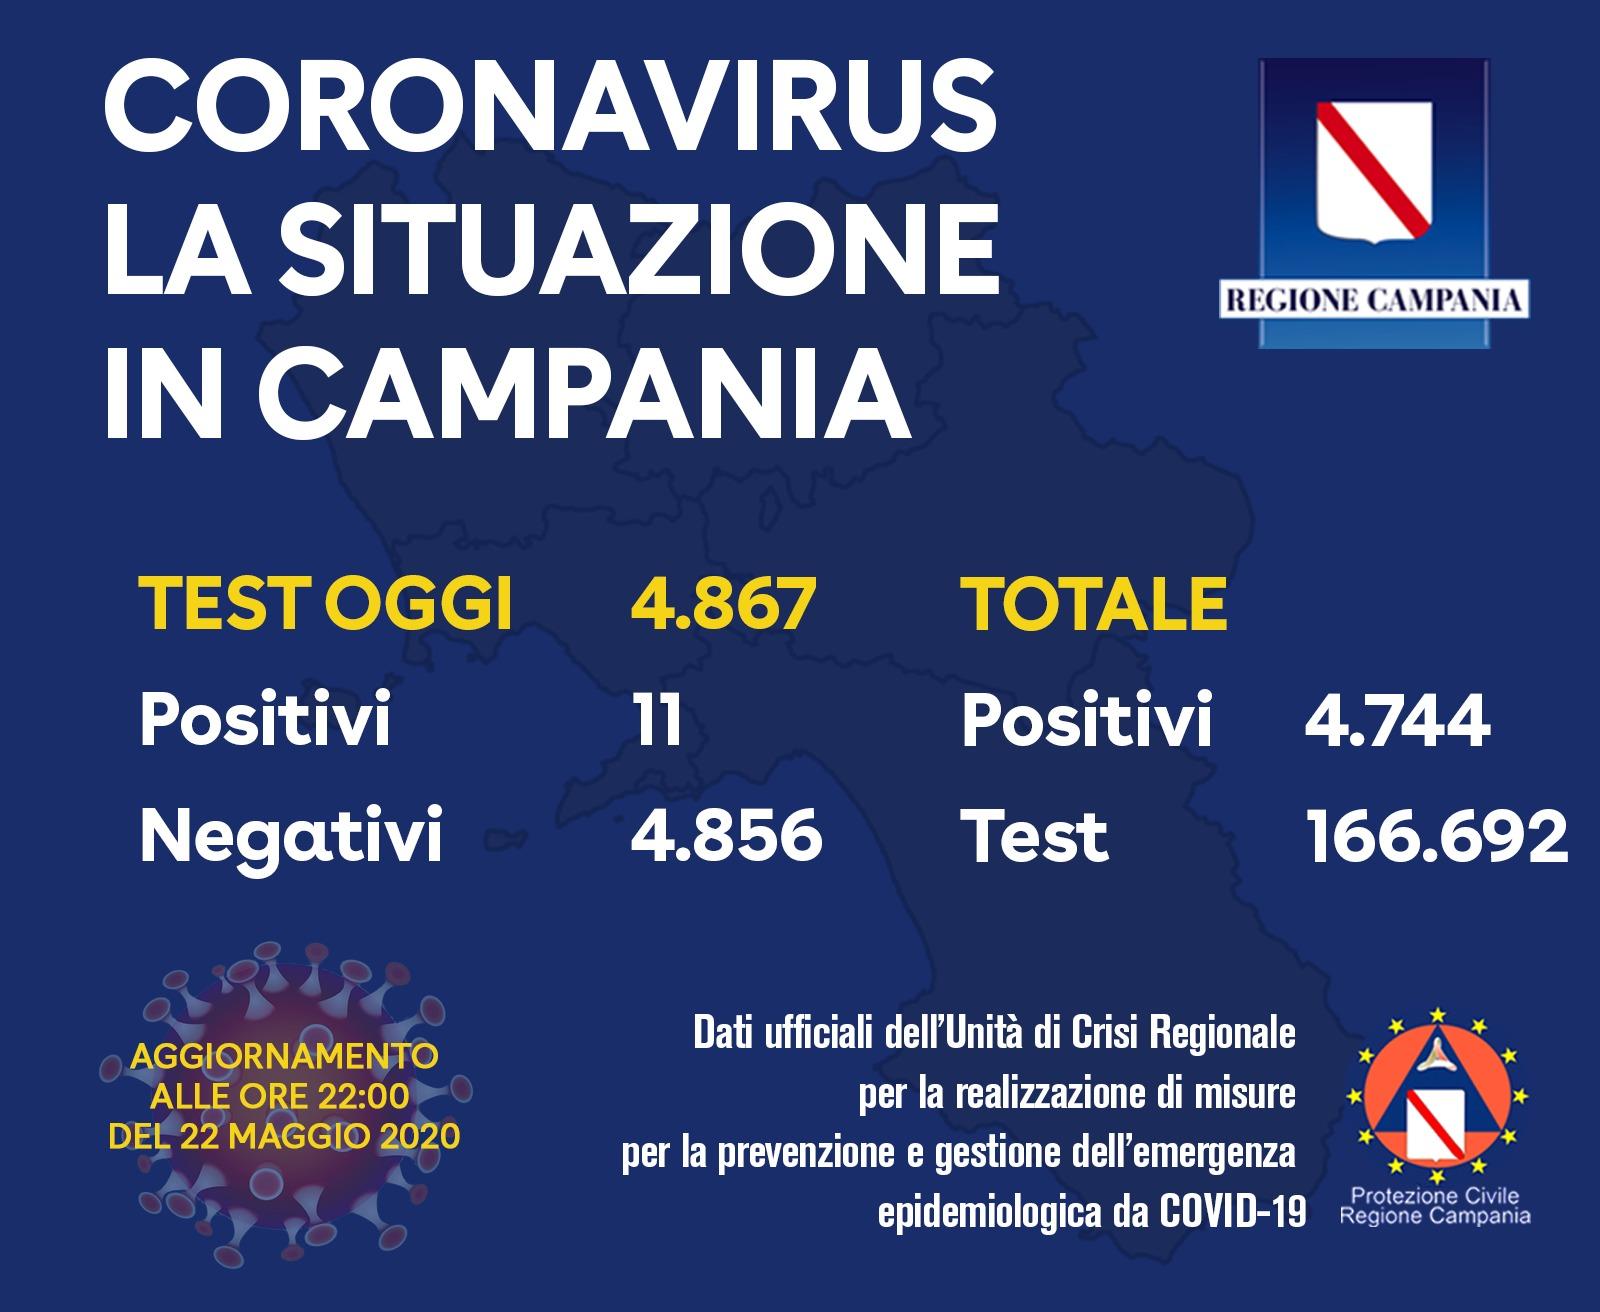 Coronavirus Campania, 11 positivi su circa 5mila tamponi